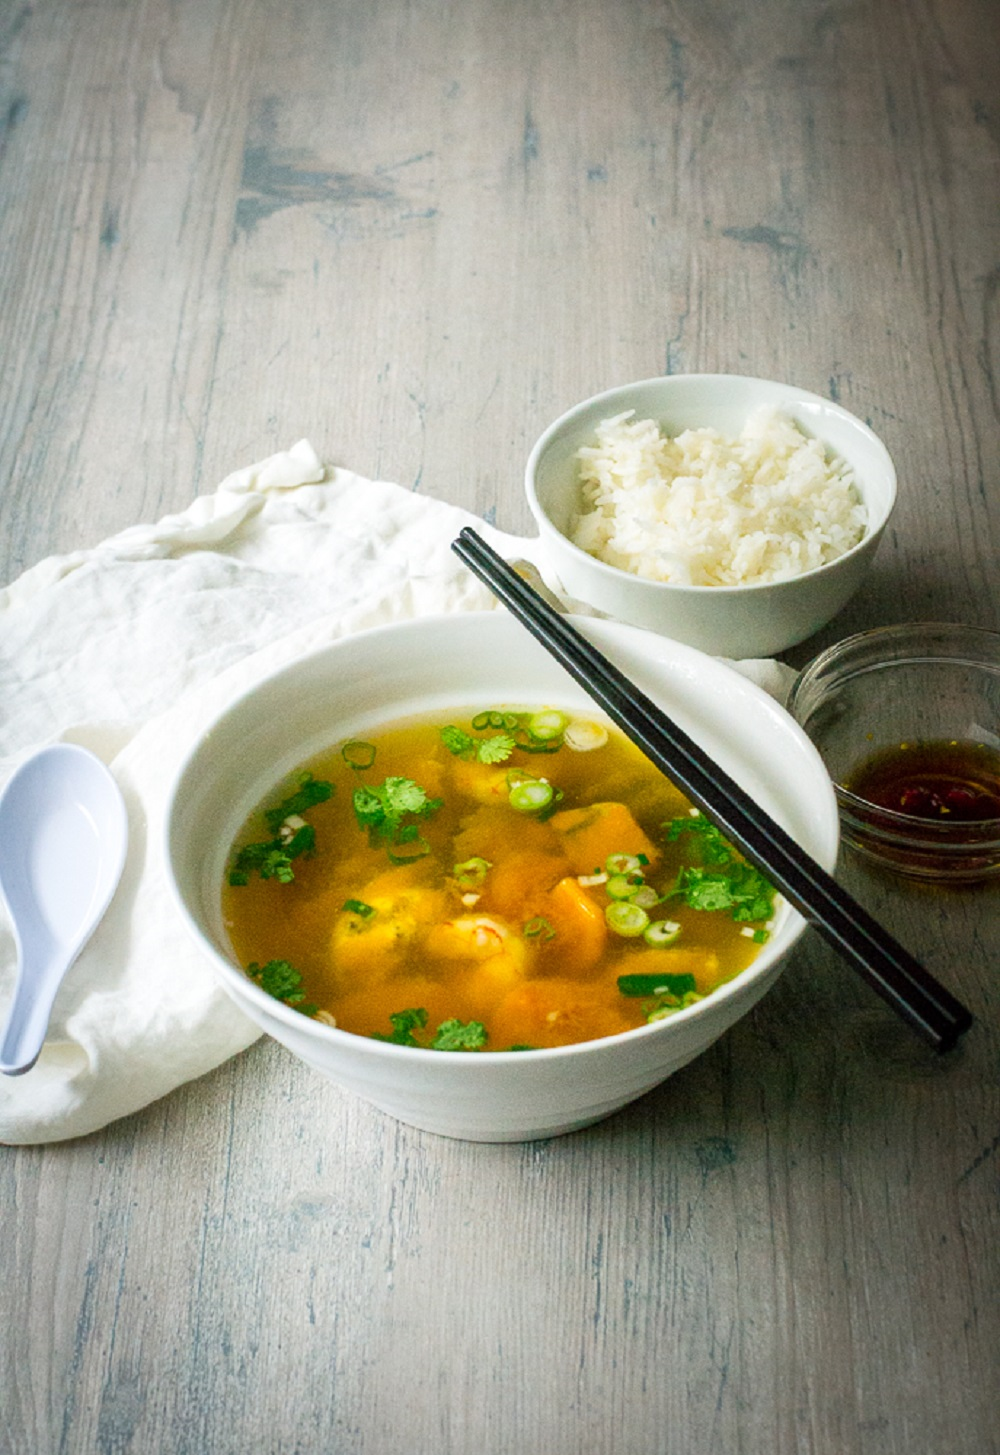 Vietnamese Kabocha Squash Soup